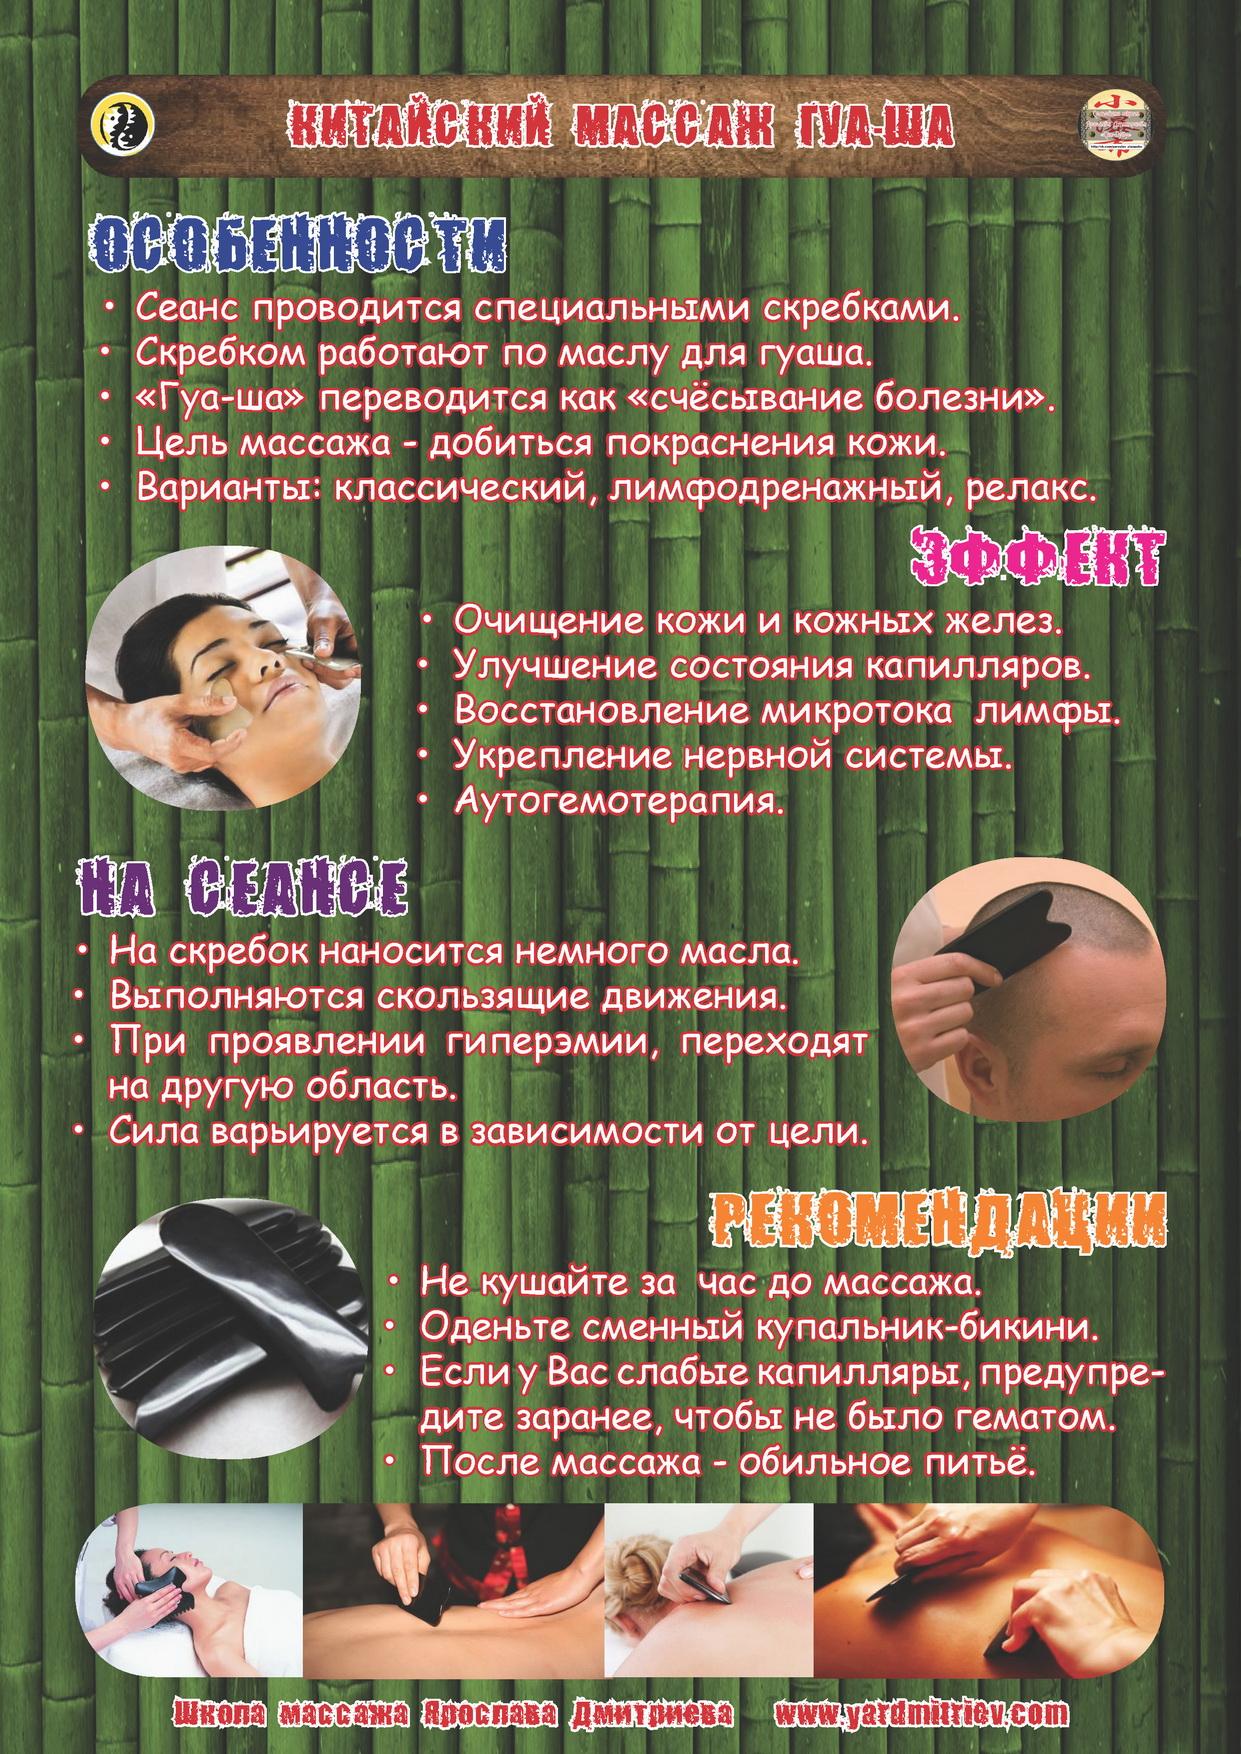 Китайский массаж гуа-ша